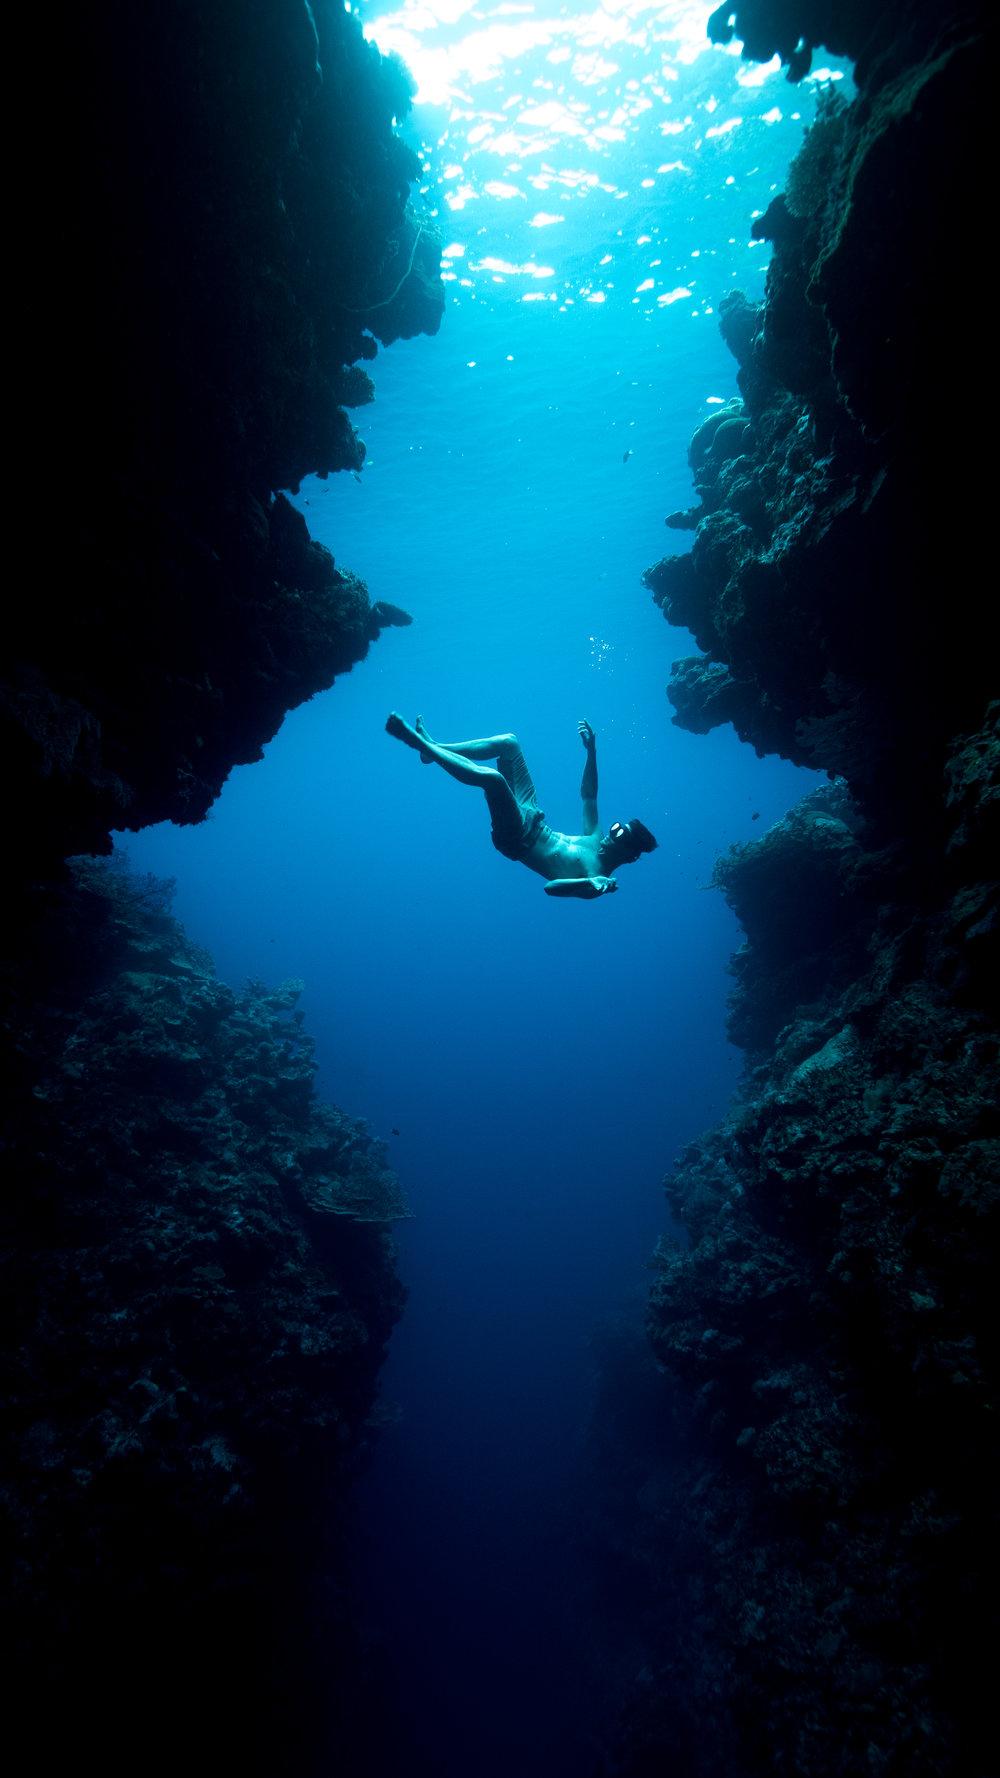 Lucas Handley falling through the cracks, 2014. Shot in the Solomon Islands by Julia Wheeler